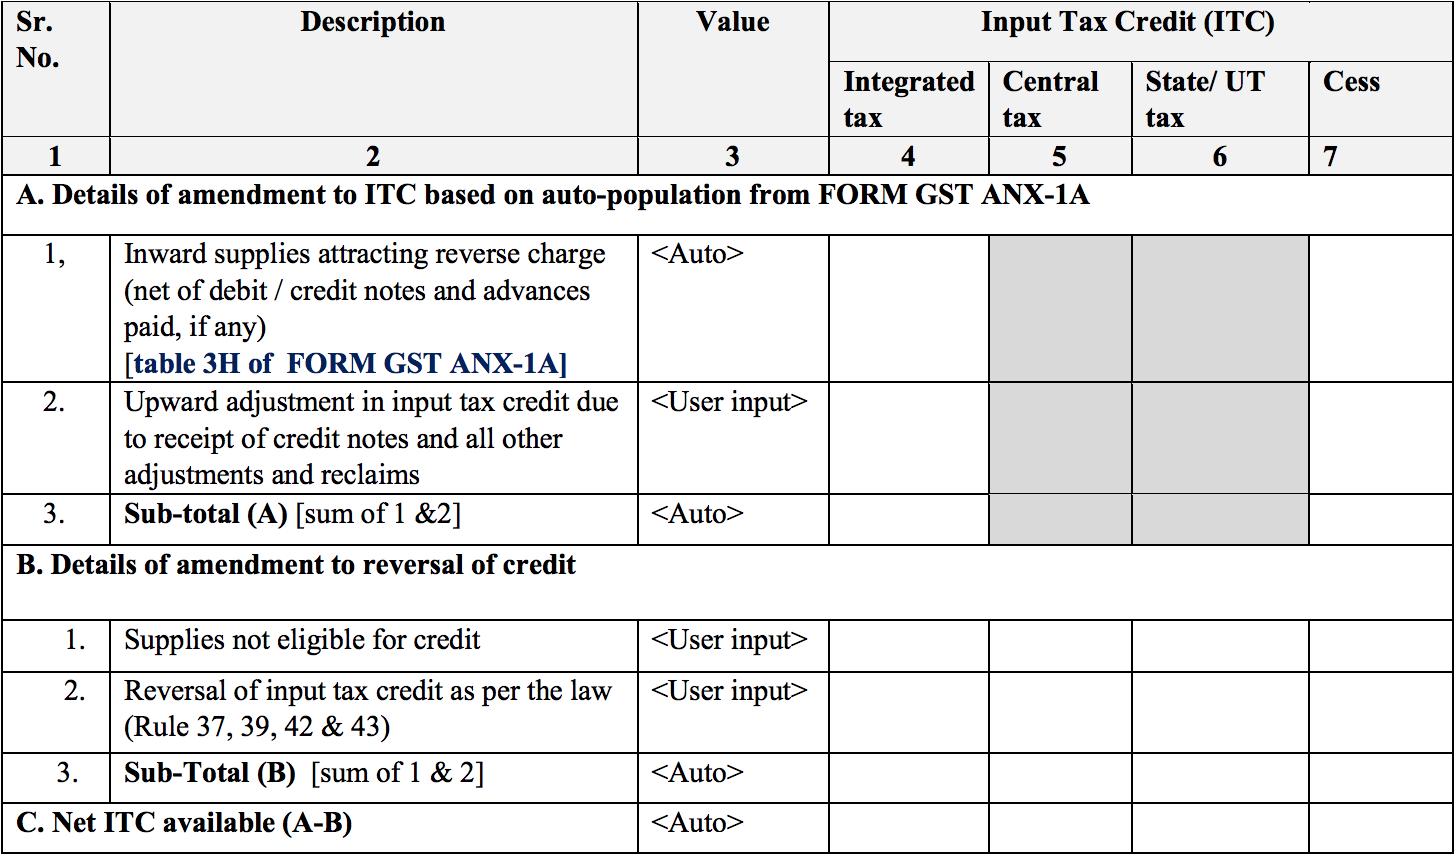 Summary of inward supplies in Sahaj return form GST RET-2